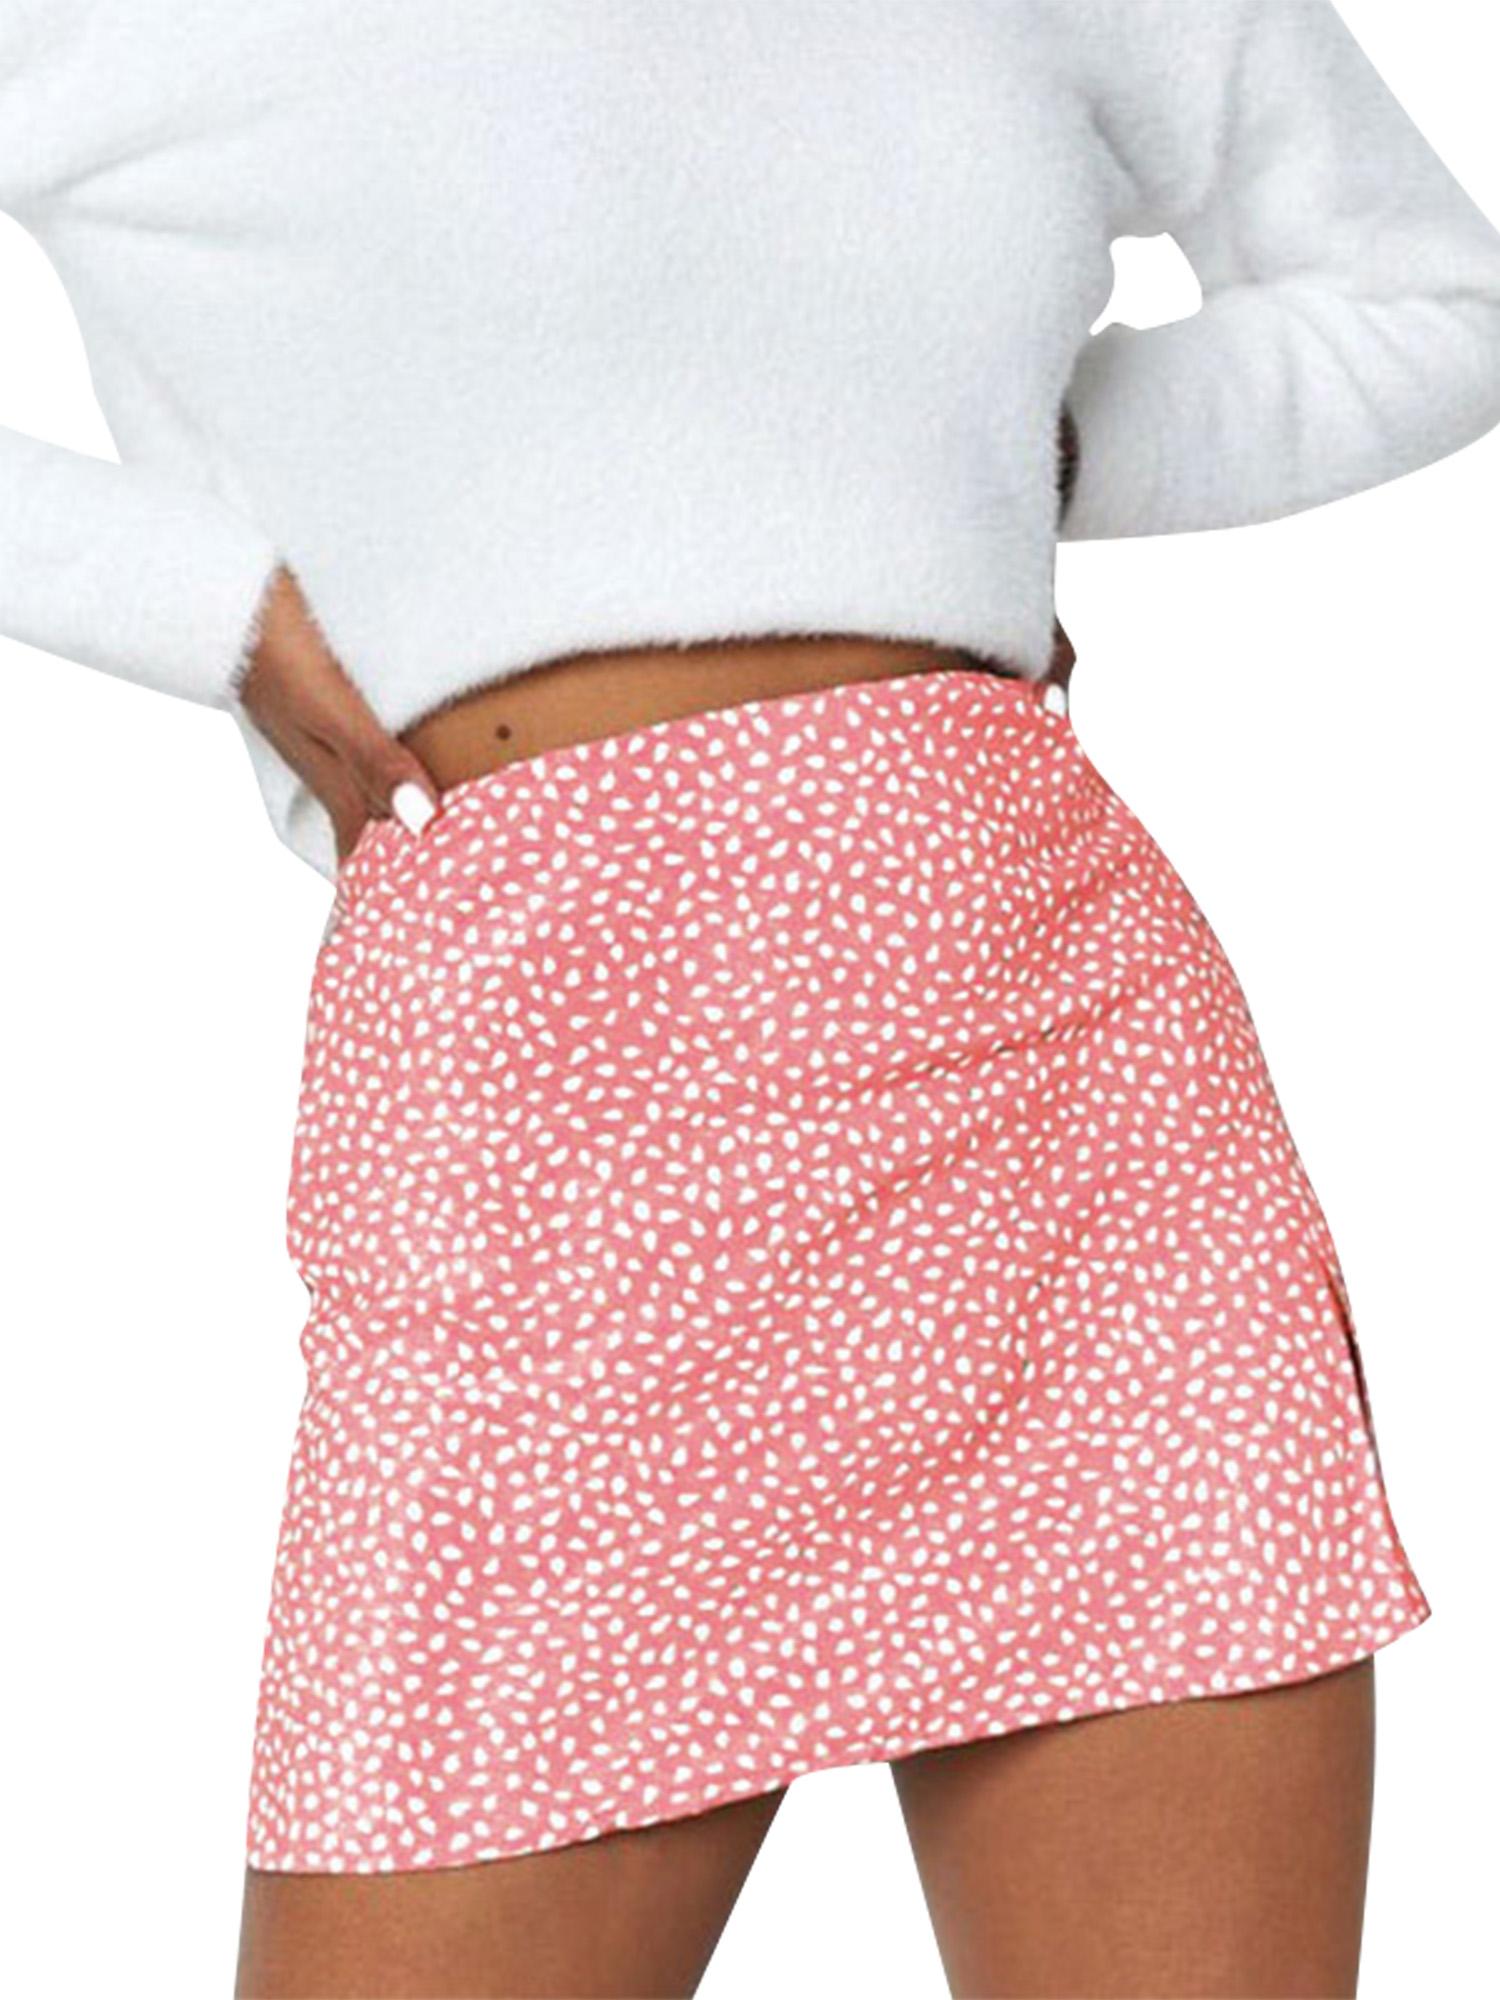 Mini skirts loose Sexy Dance Women High Waist Tie Dye Leopard Printed A Line Skirts Summer Loose Mini Skirt Walmart Com Walmart Com